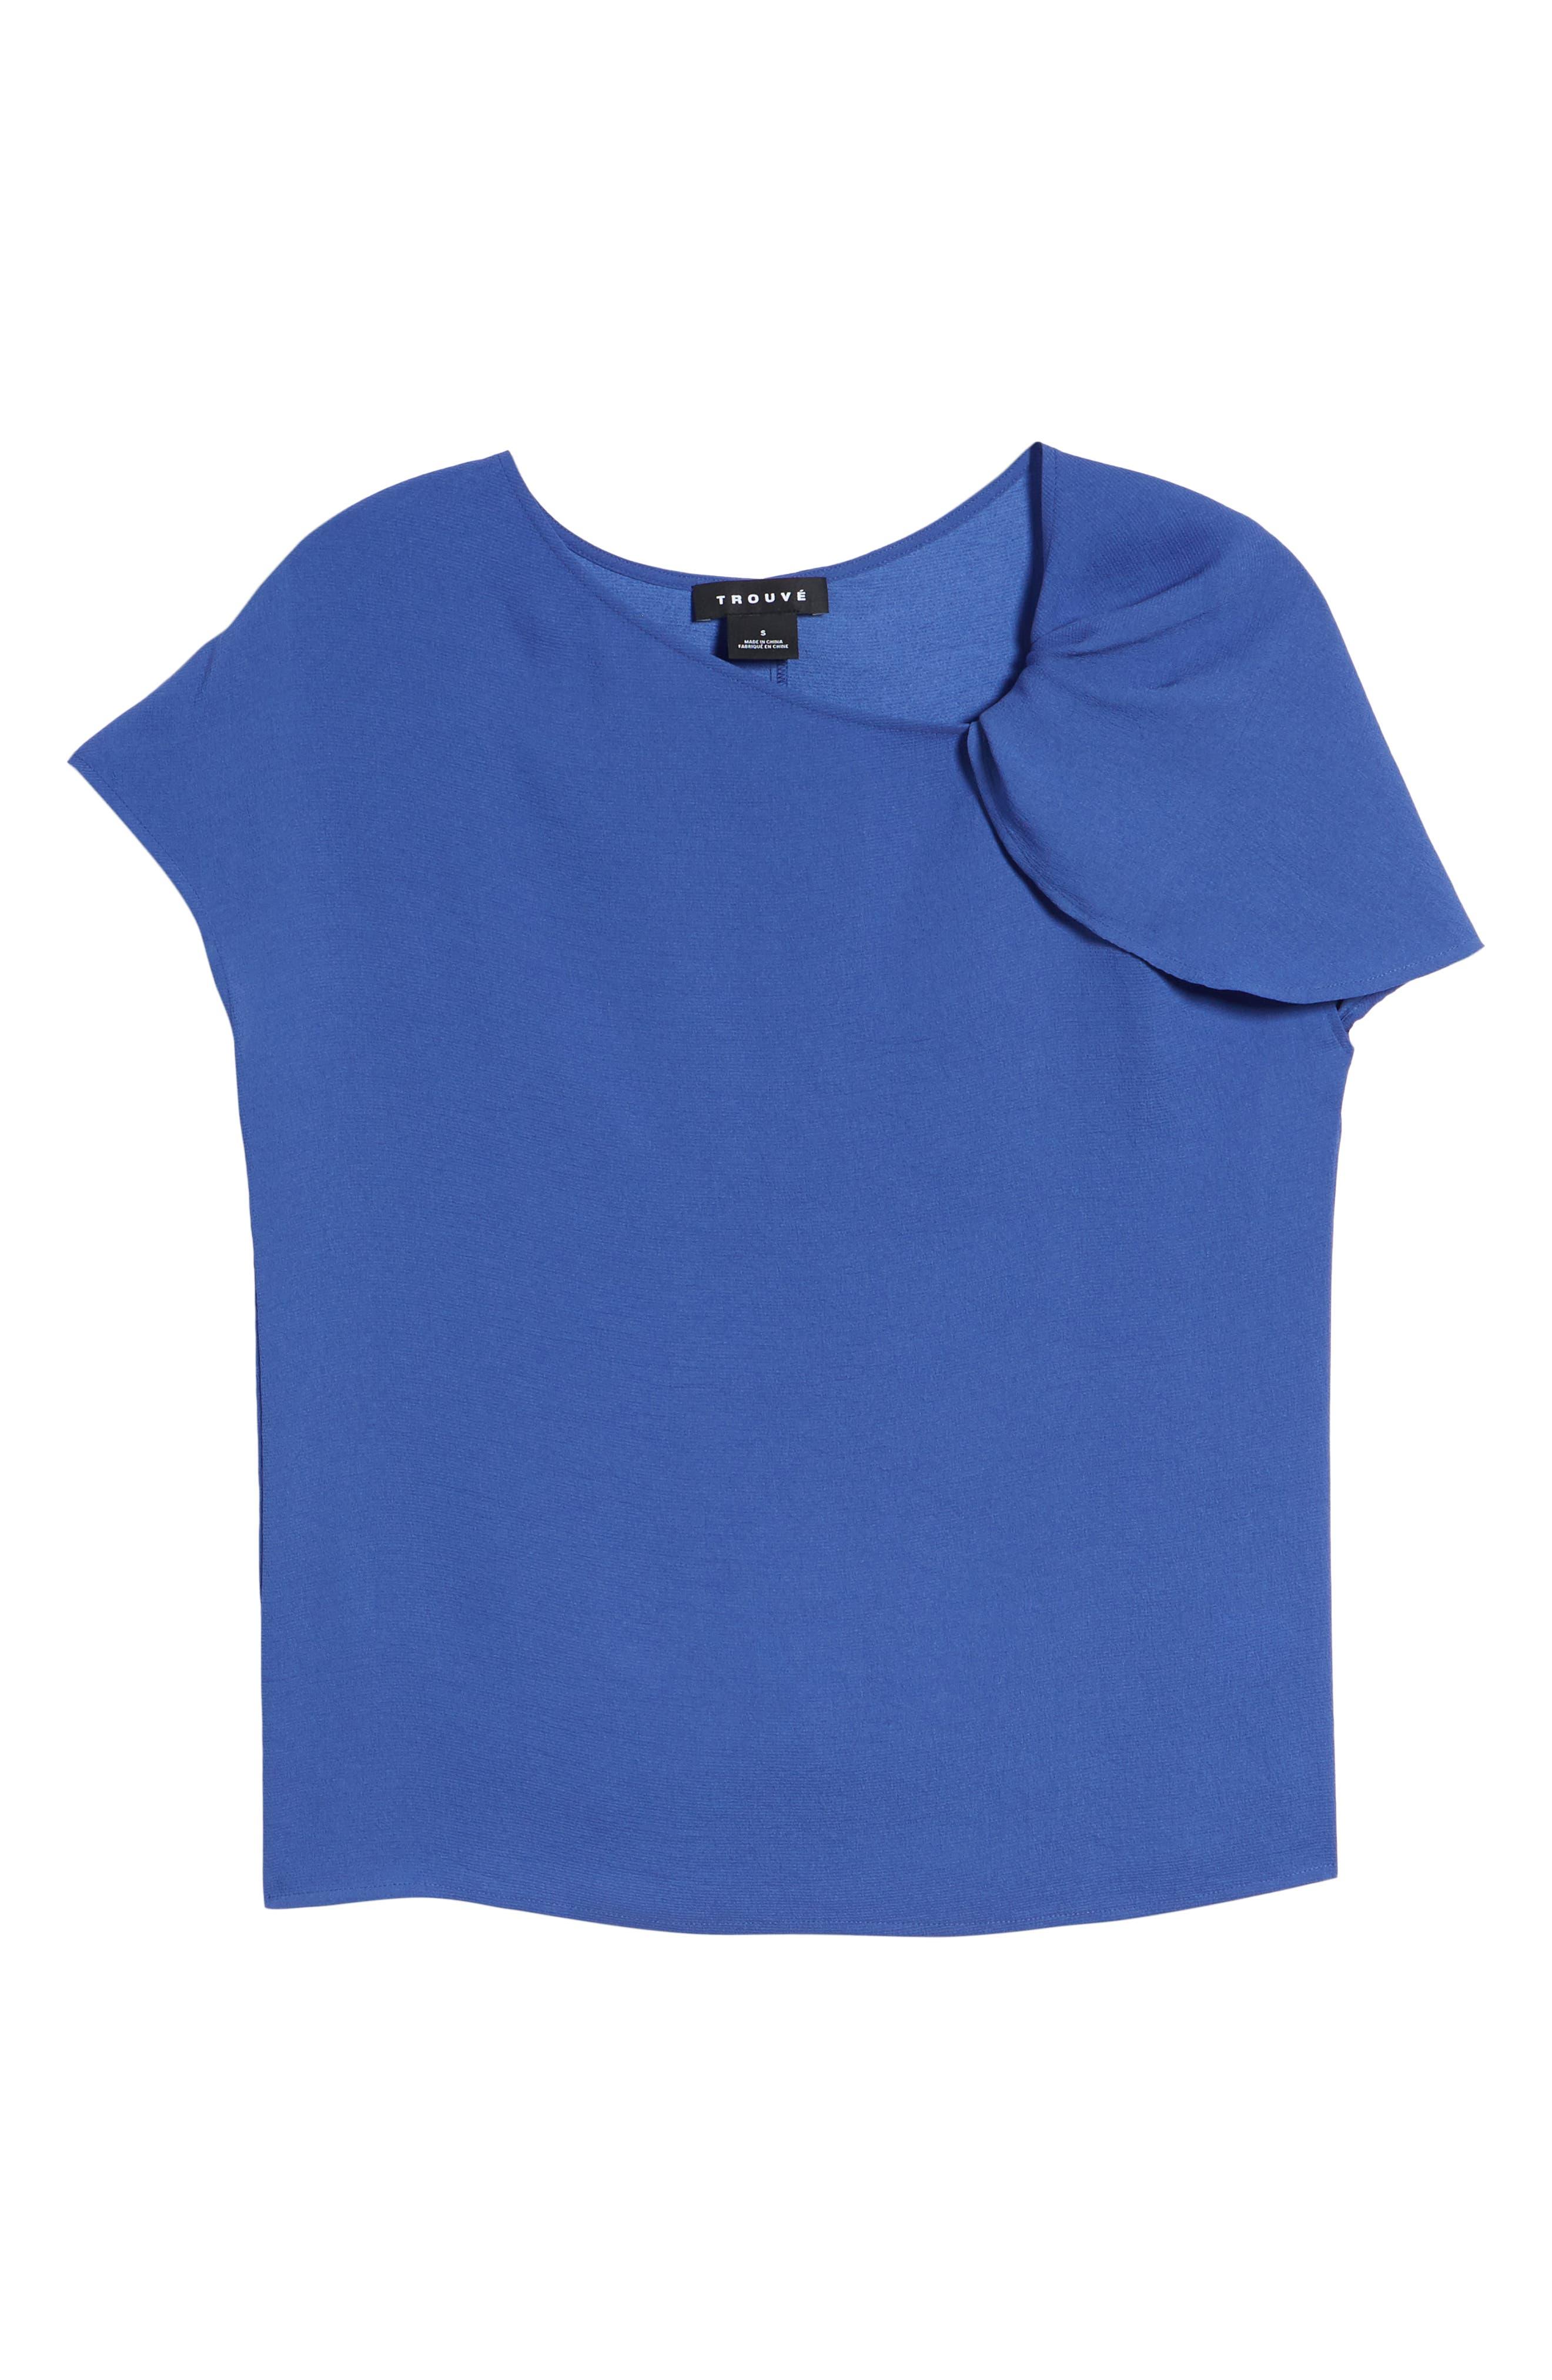 Asymmetrical Shoulder Top,                             Alternate thumbnail 7, color,                             420